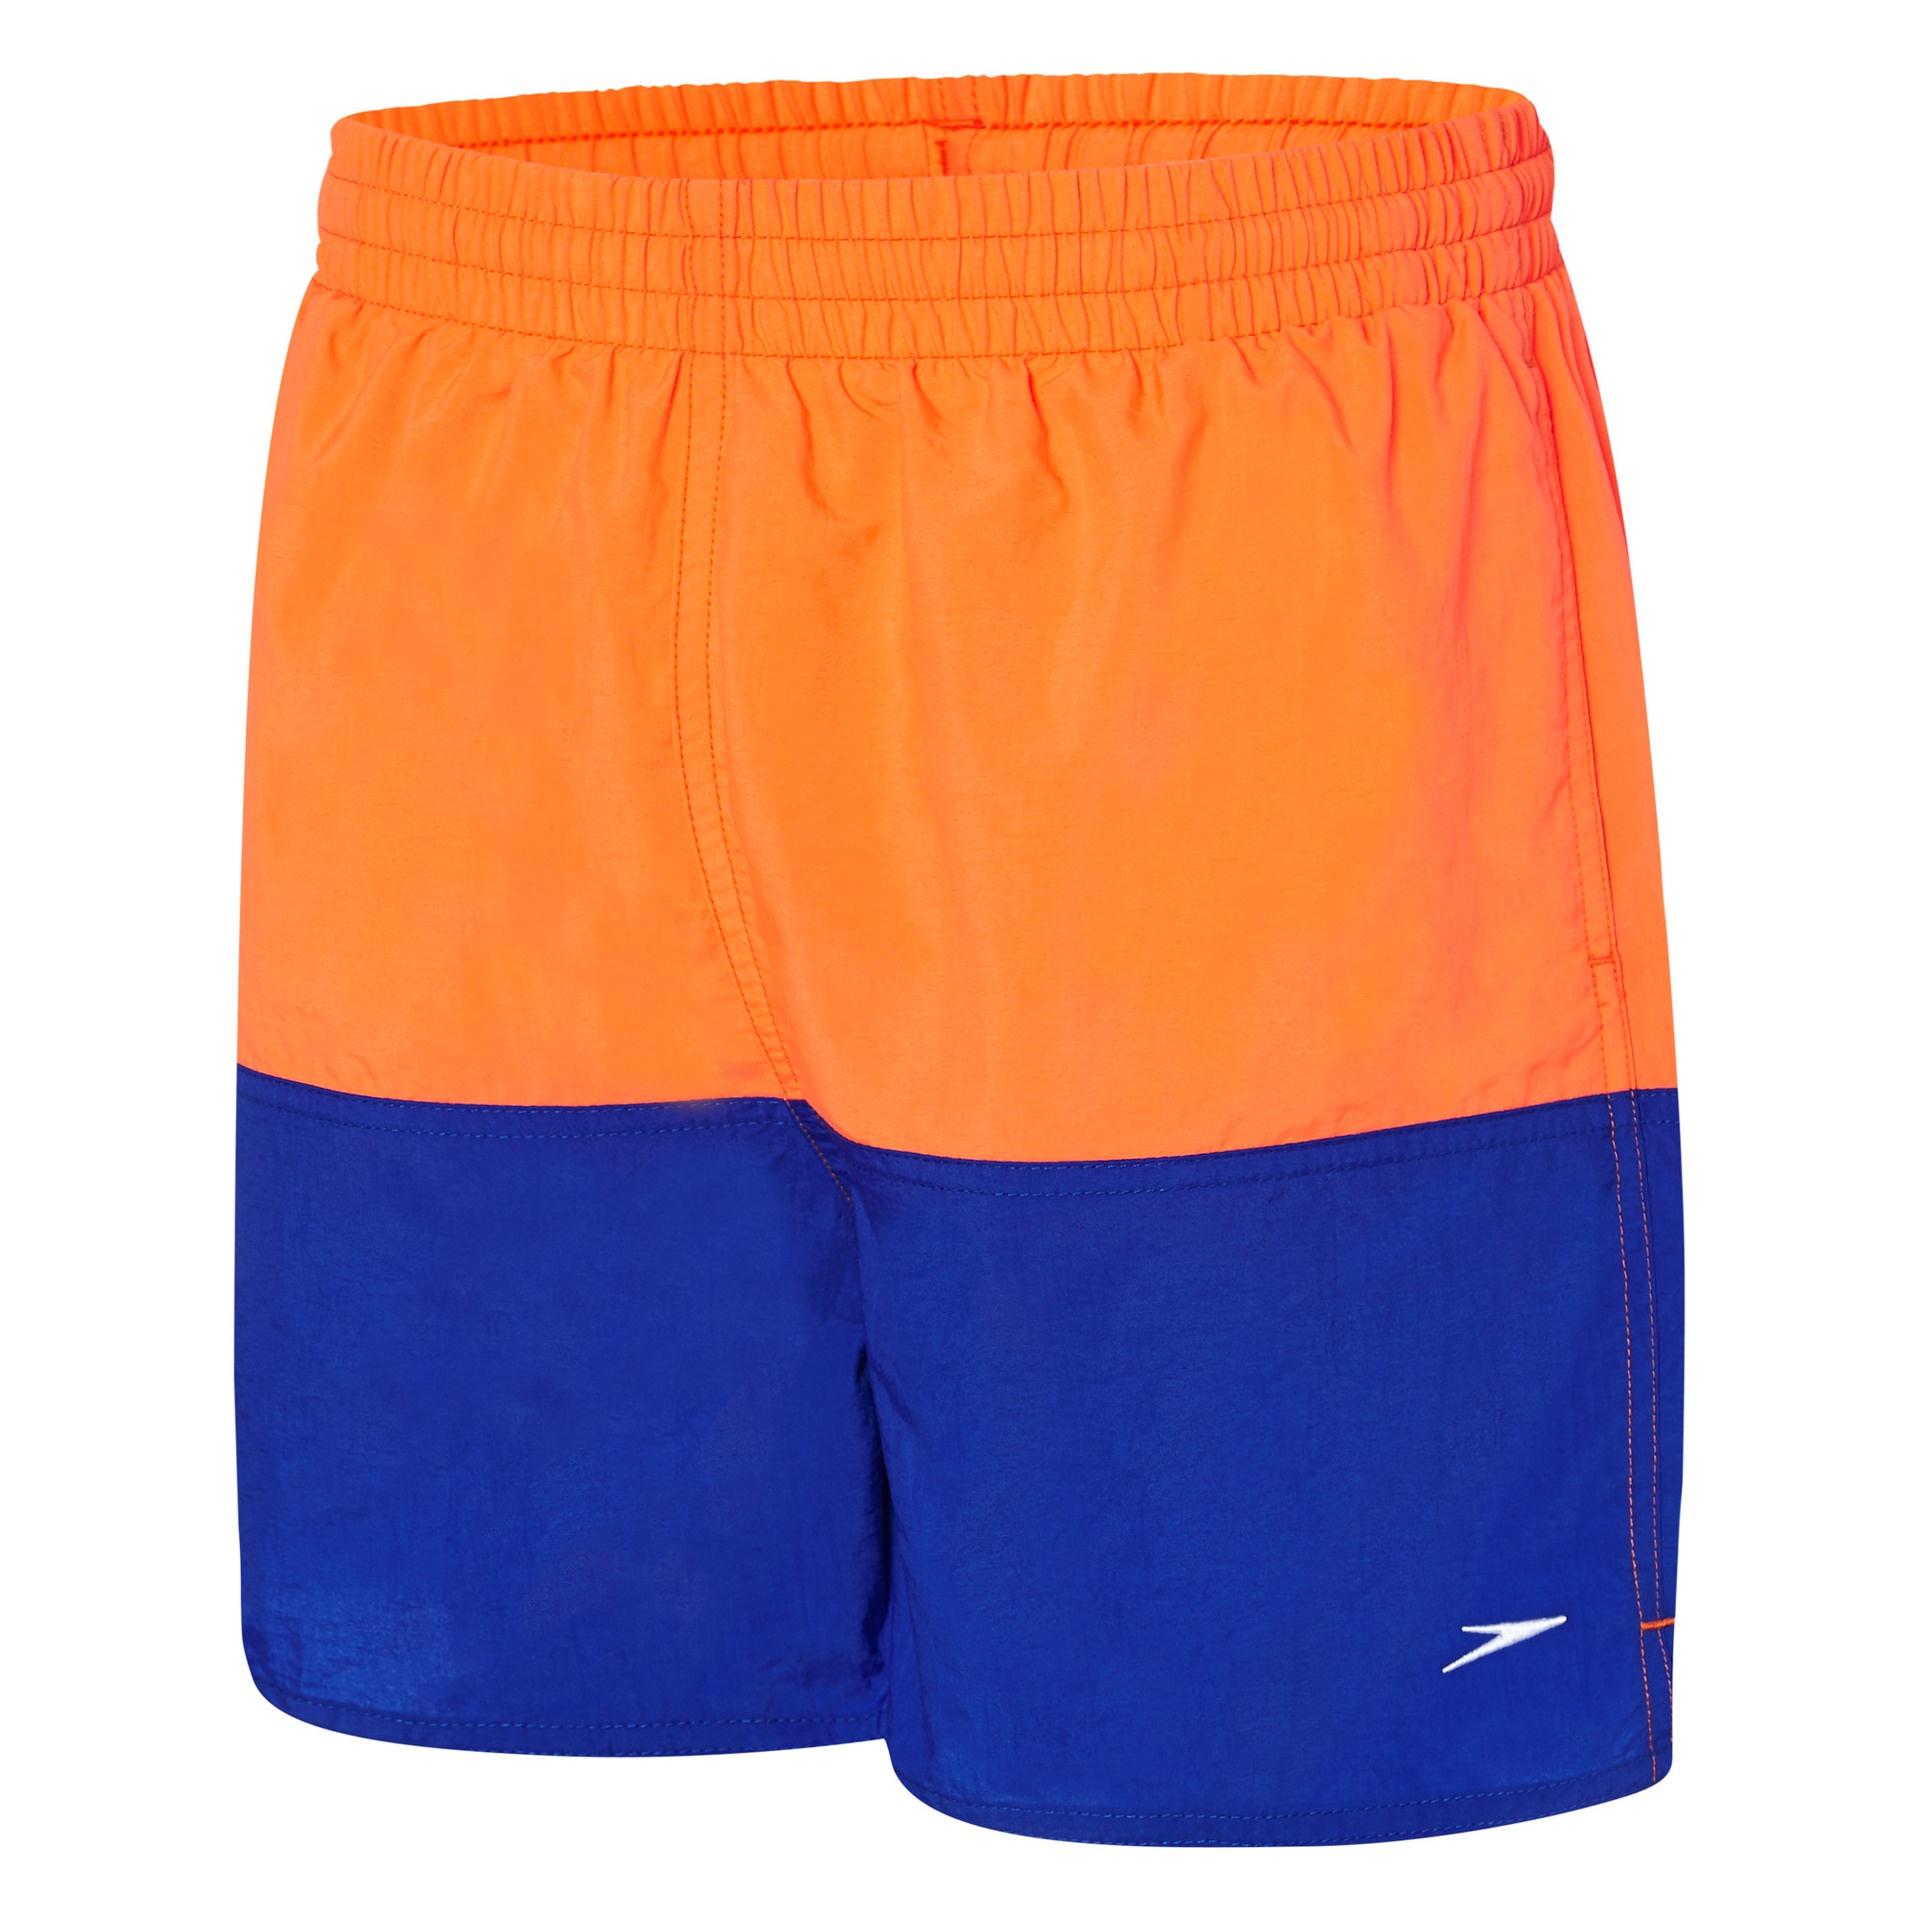 5a98d9a9e2257c Boys Panel Solid Leisure Watershort Vivid Orange/Speed/Bali Blue ...